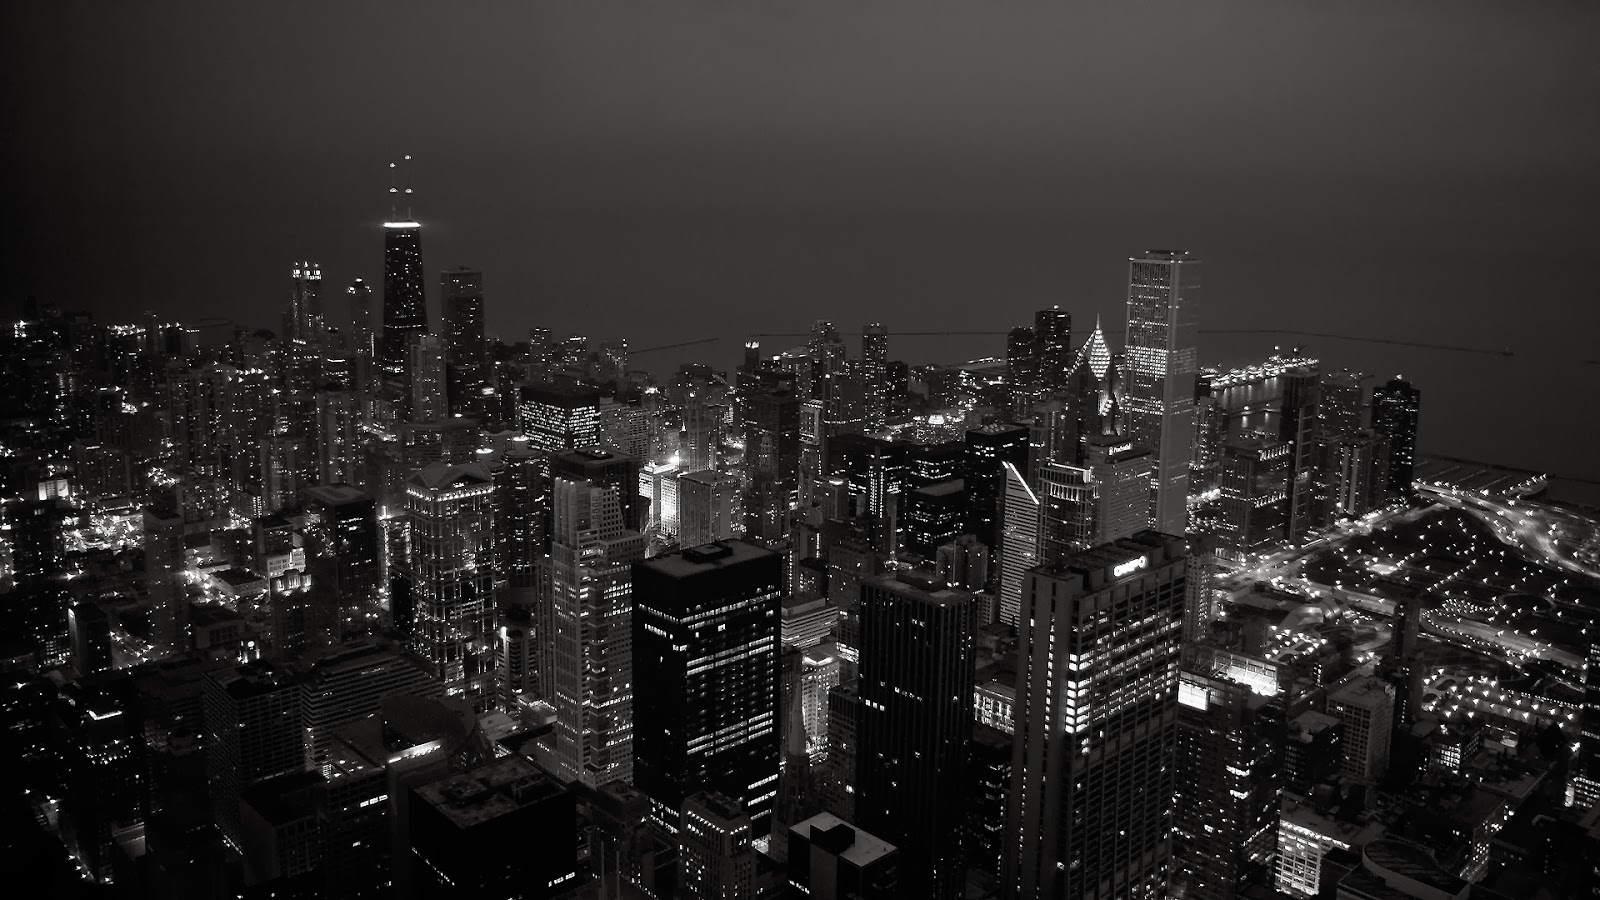 City view at night live wallpaper Wallpaper view 1600x900